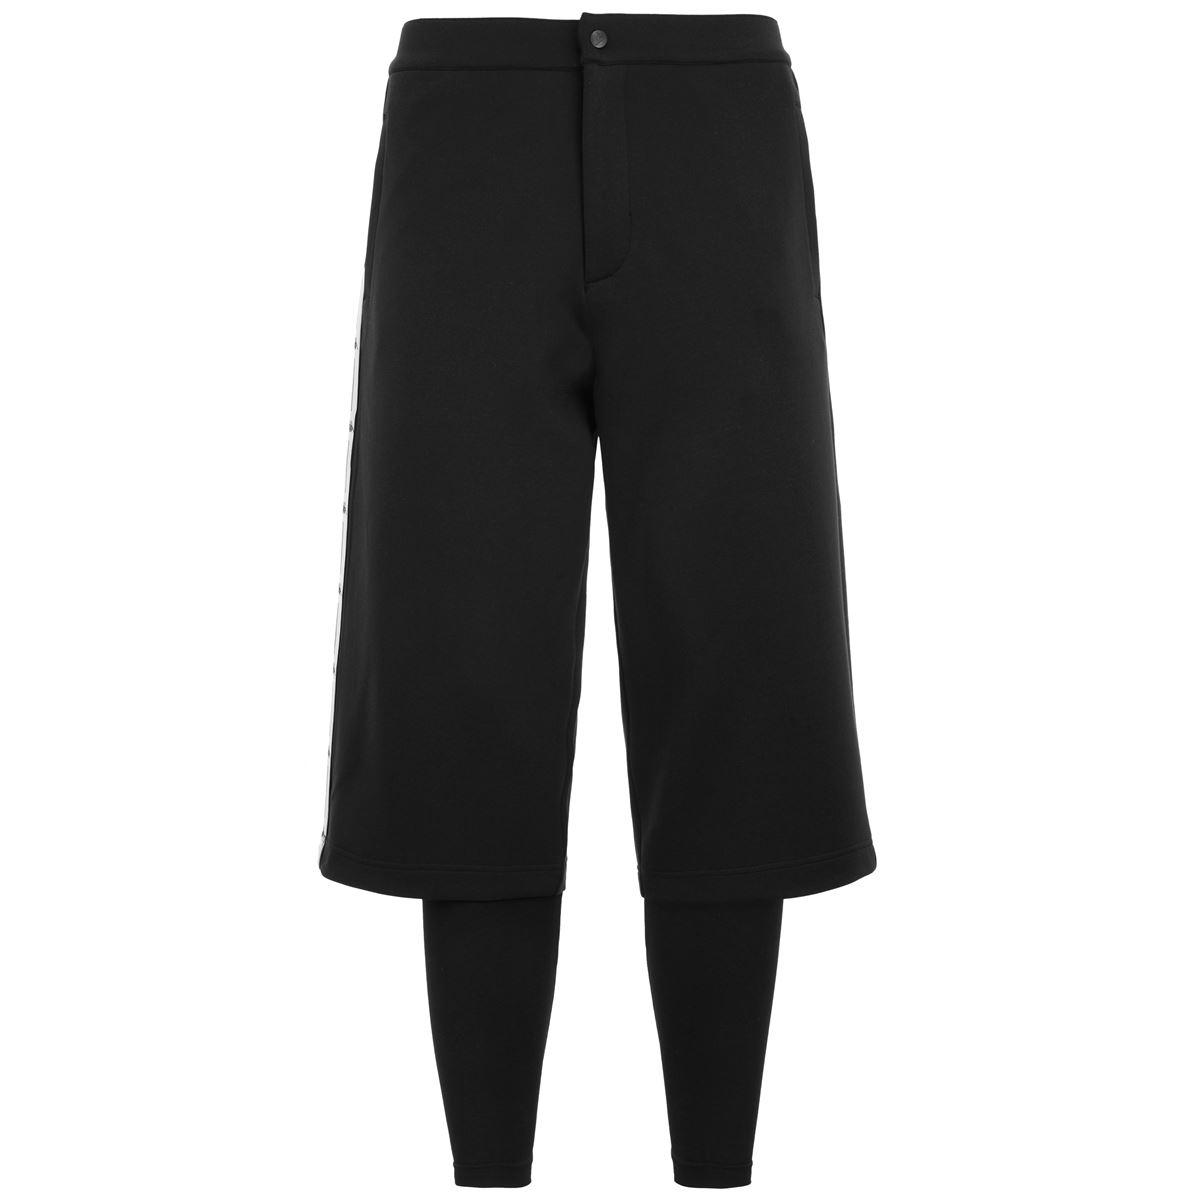 Kappa Pantaloni uomo-311177W